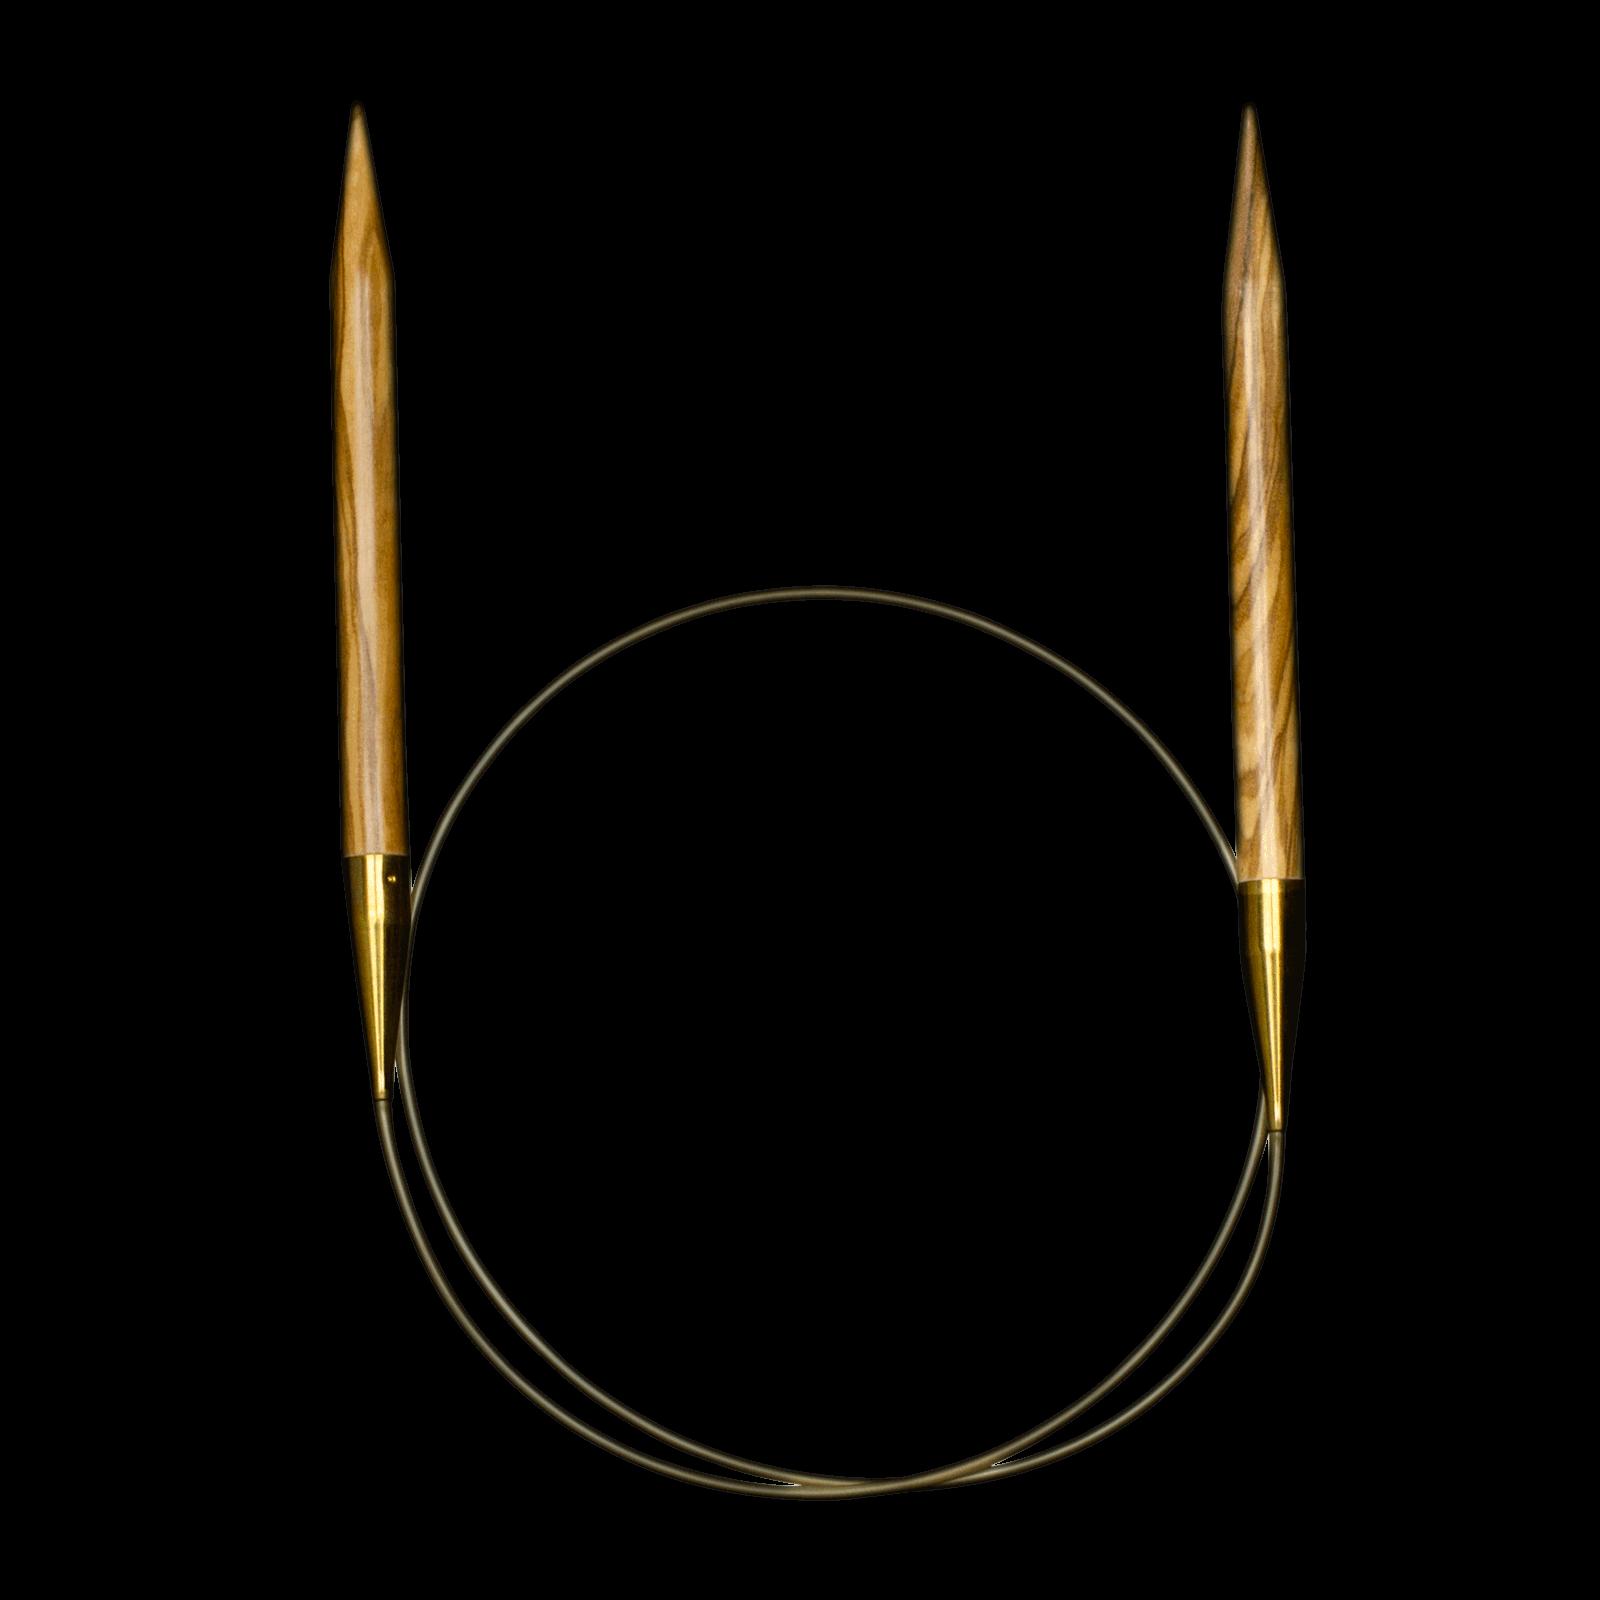 Addi Nature Olive 16 Circular Needles